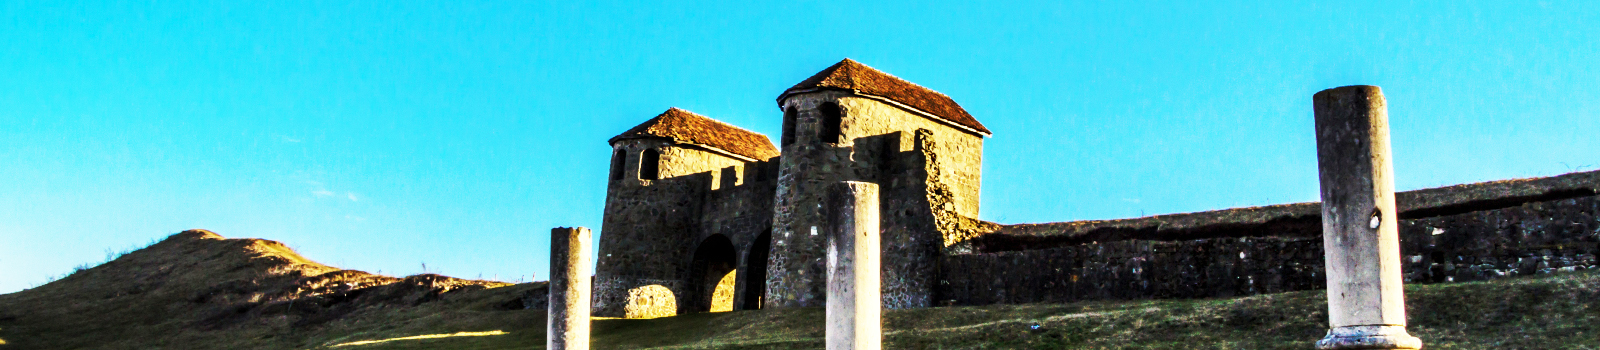 Complexul Arheologic Porolissum